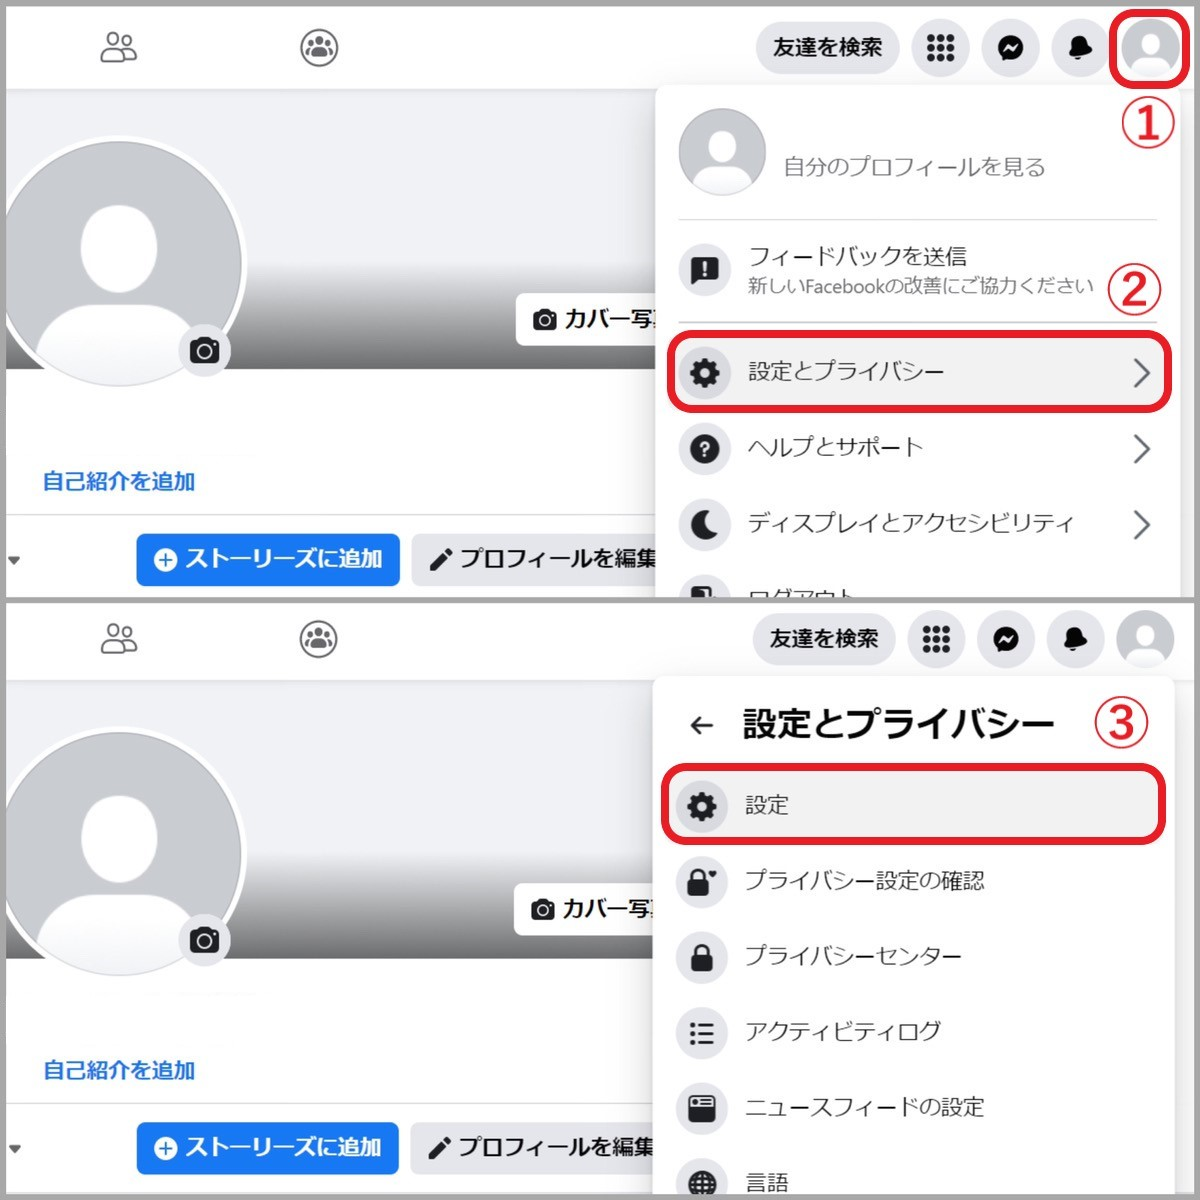 Facebookの退会(アカウント削除)の手順画像